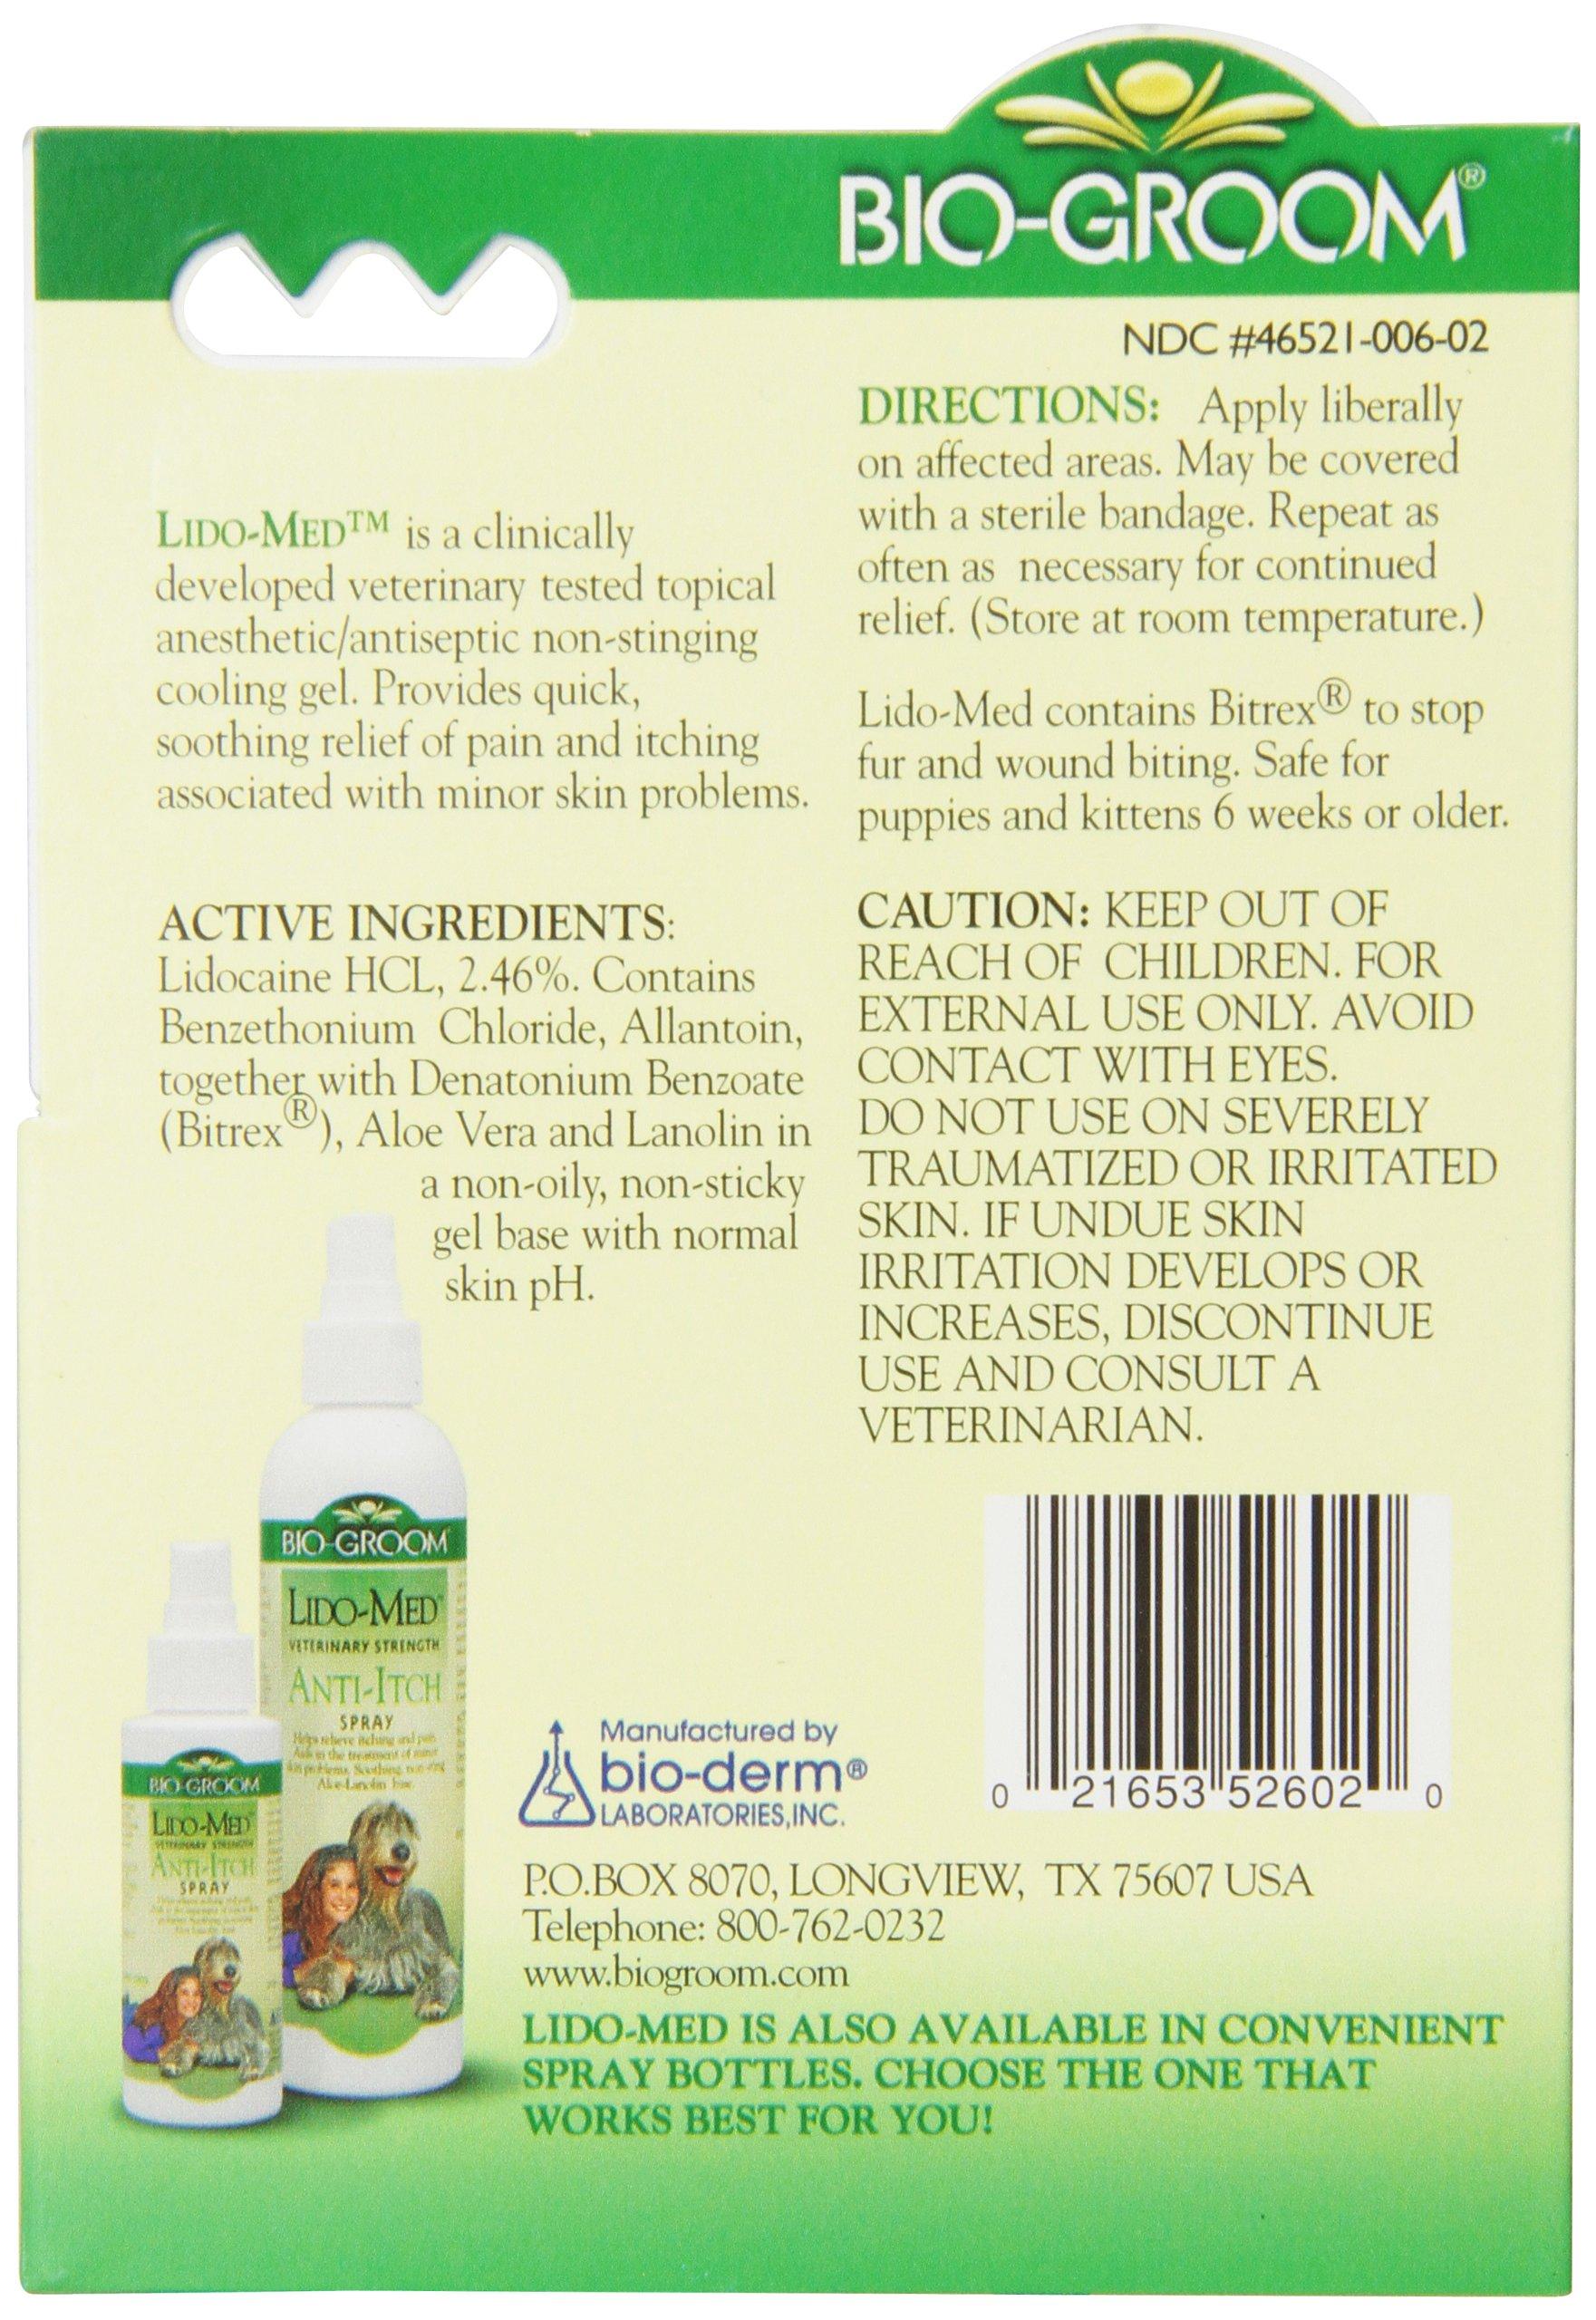 Bio-groom Lido Med Anti Itch Gel, 2-Ounce